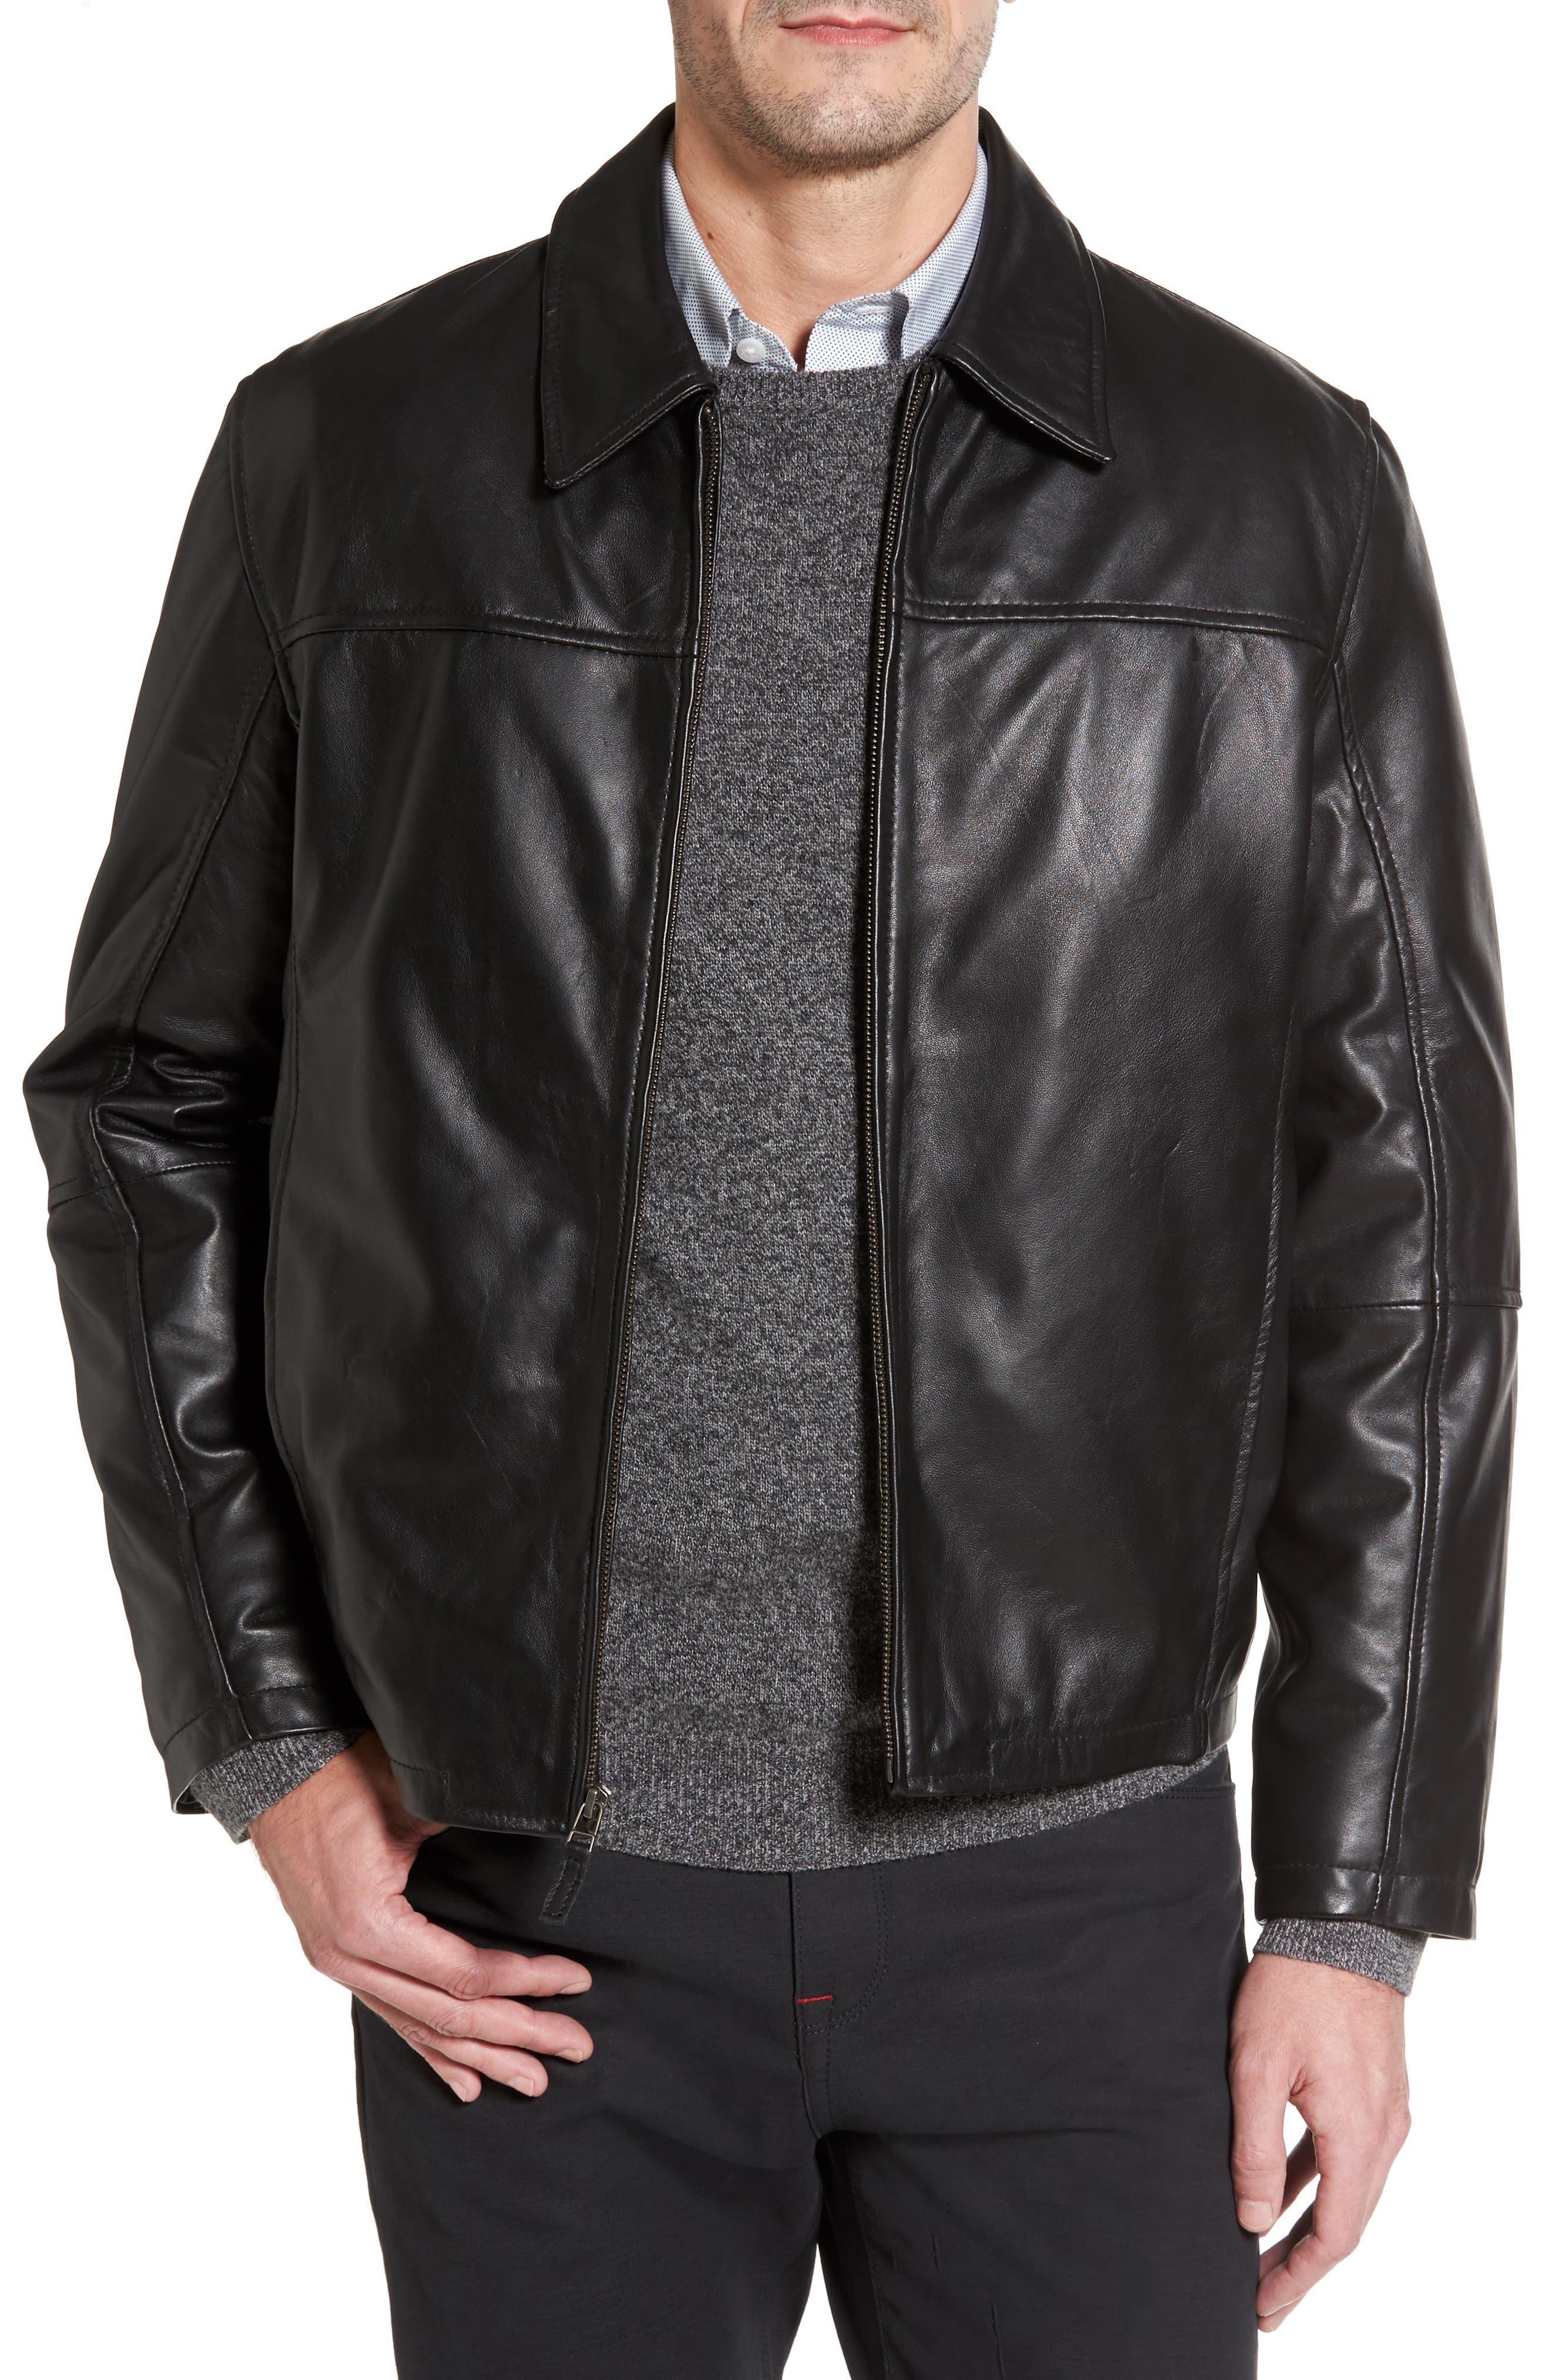 Main Image - Missani Le Collezioni Collared Leather Jacket